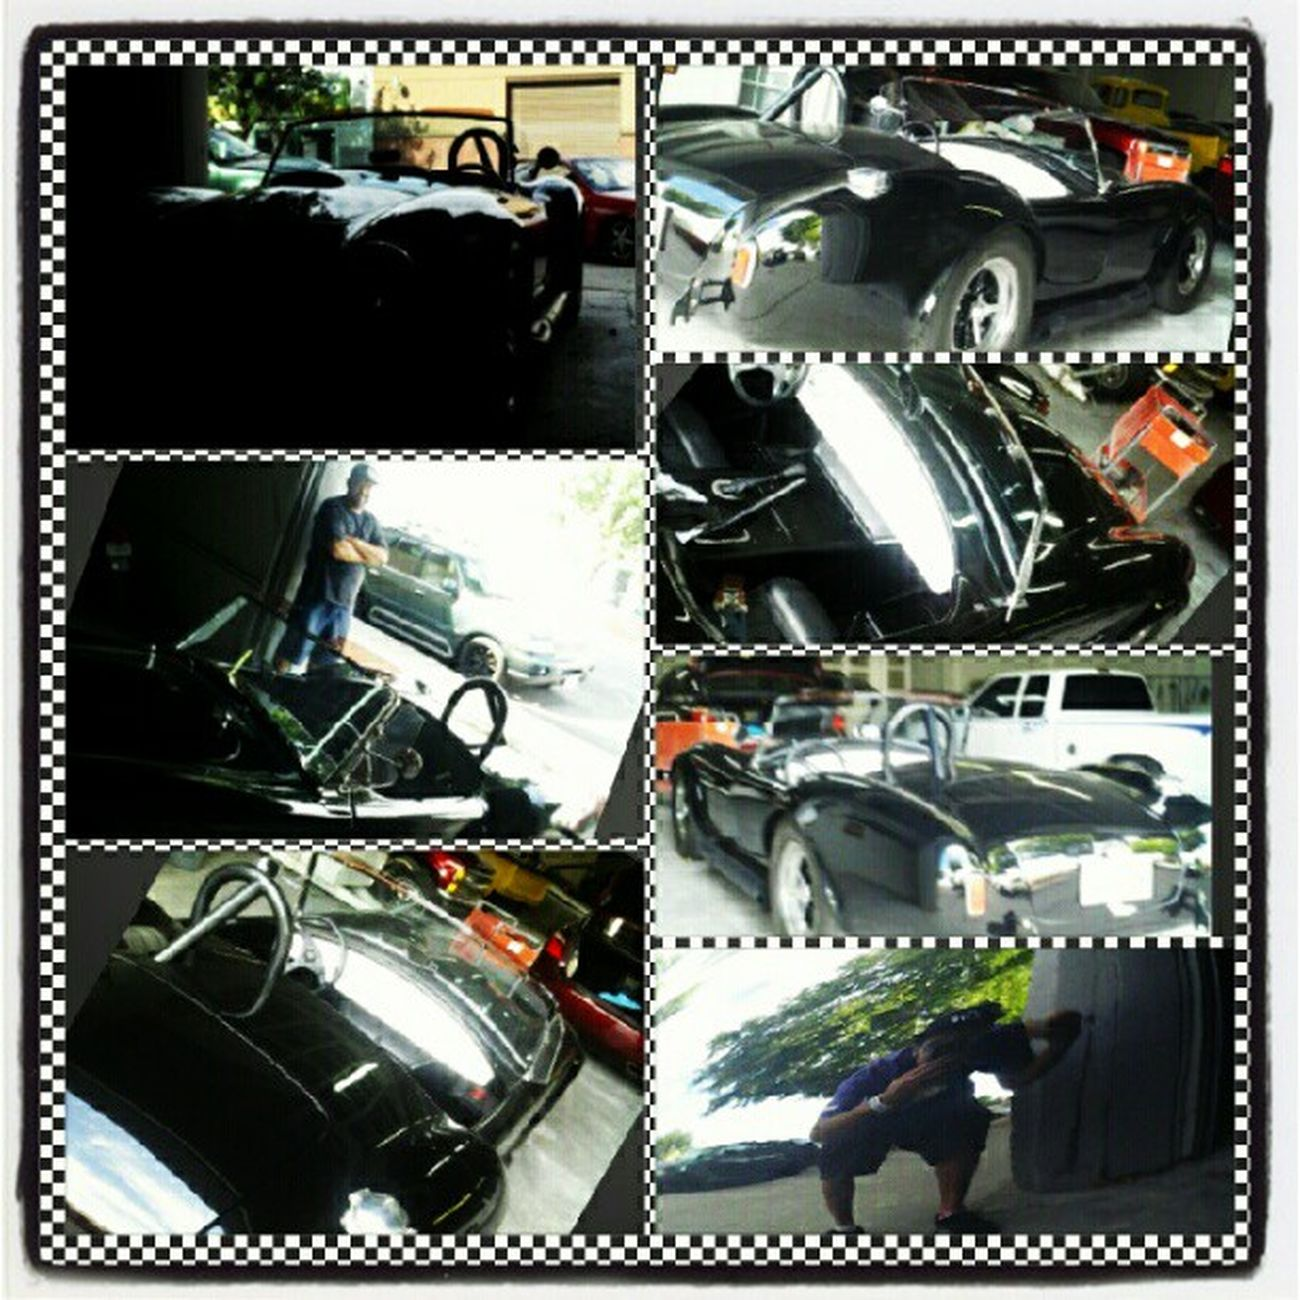 @loco_icon Autobody Homiesshop Coolride Cobra Fulltubedchasis Fast DOPE :D